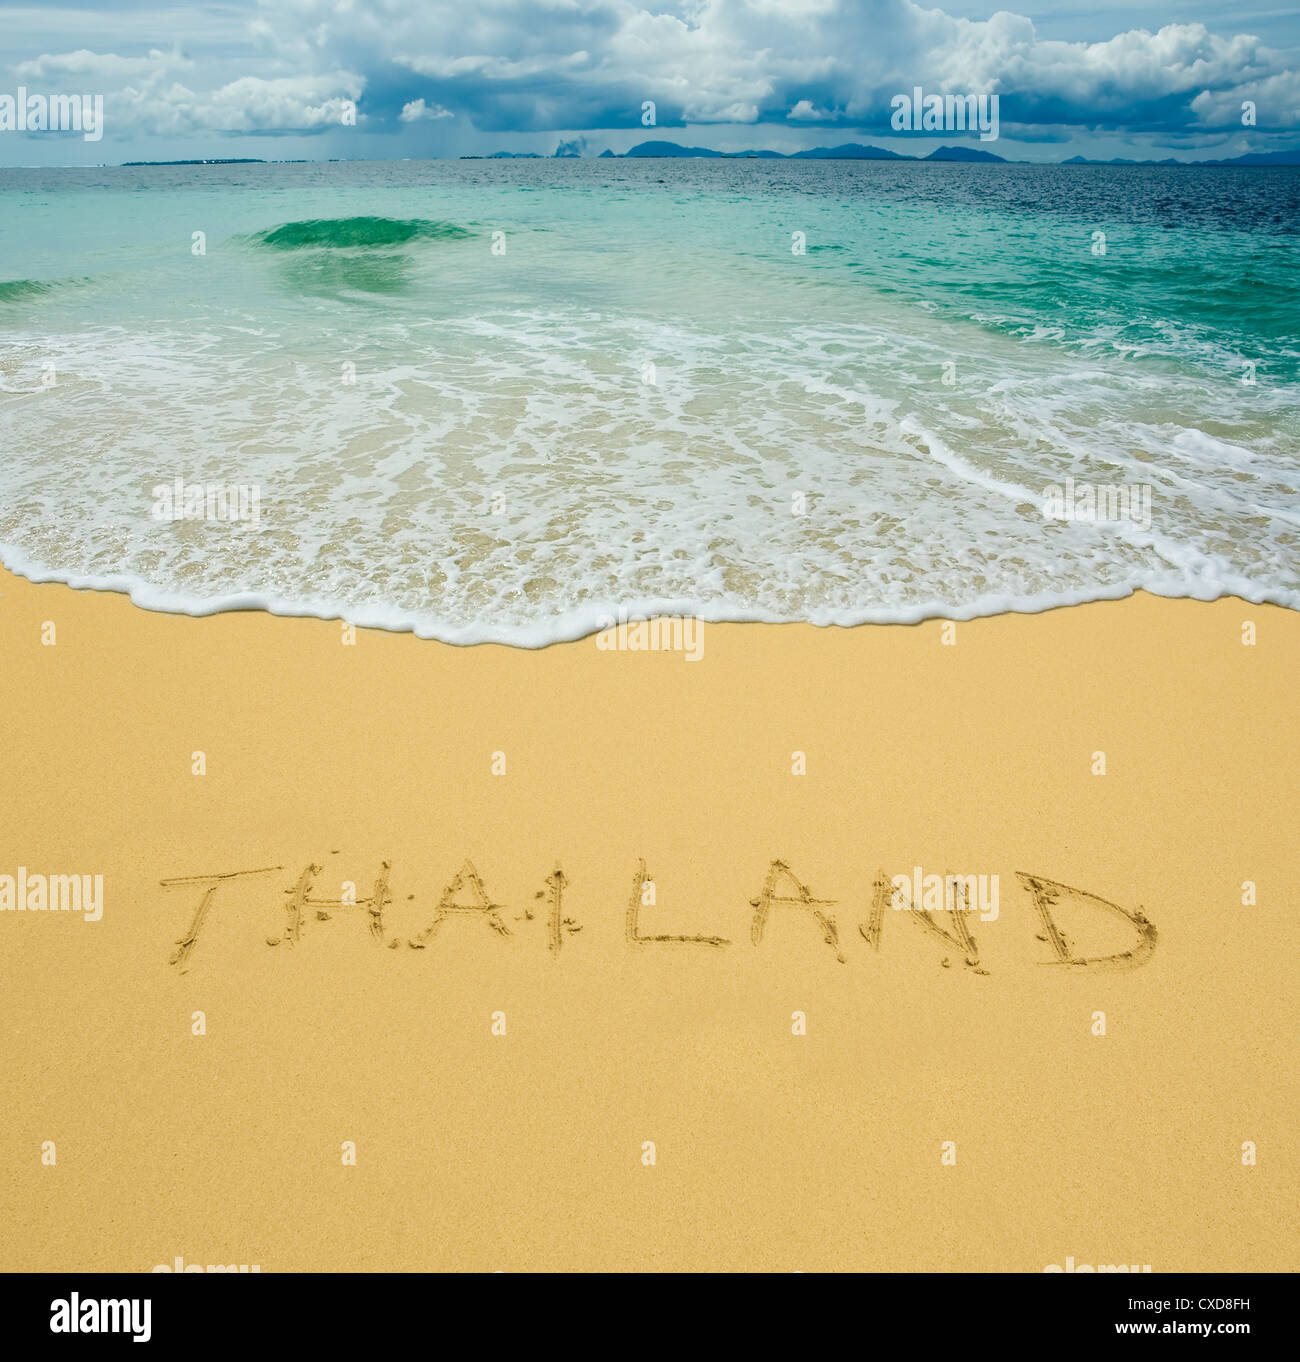 thailand written in a sandy tropical beach - Stock Image